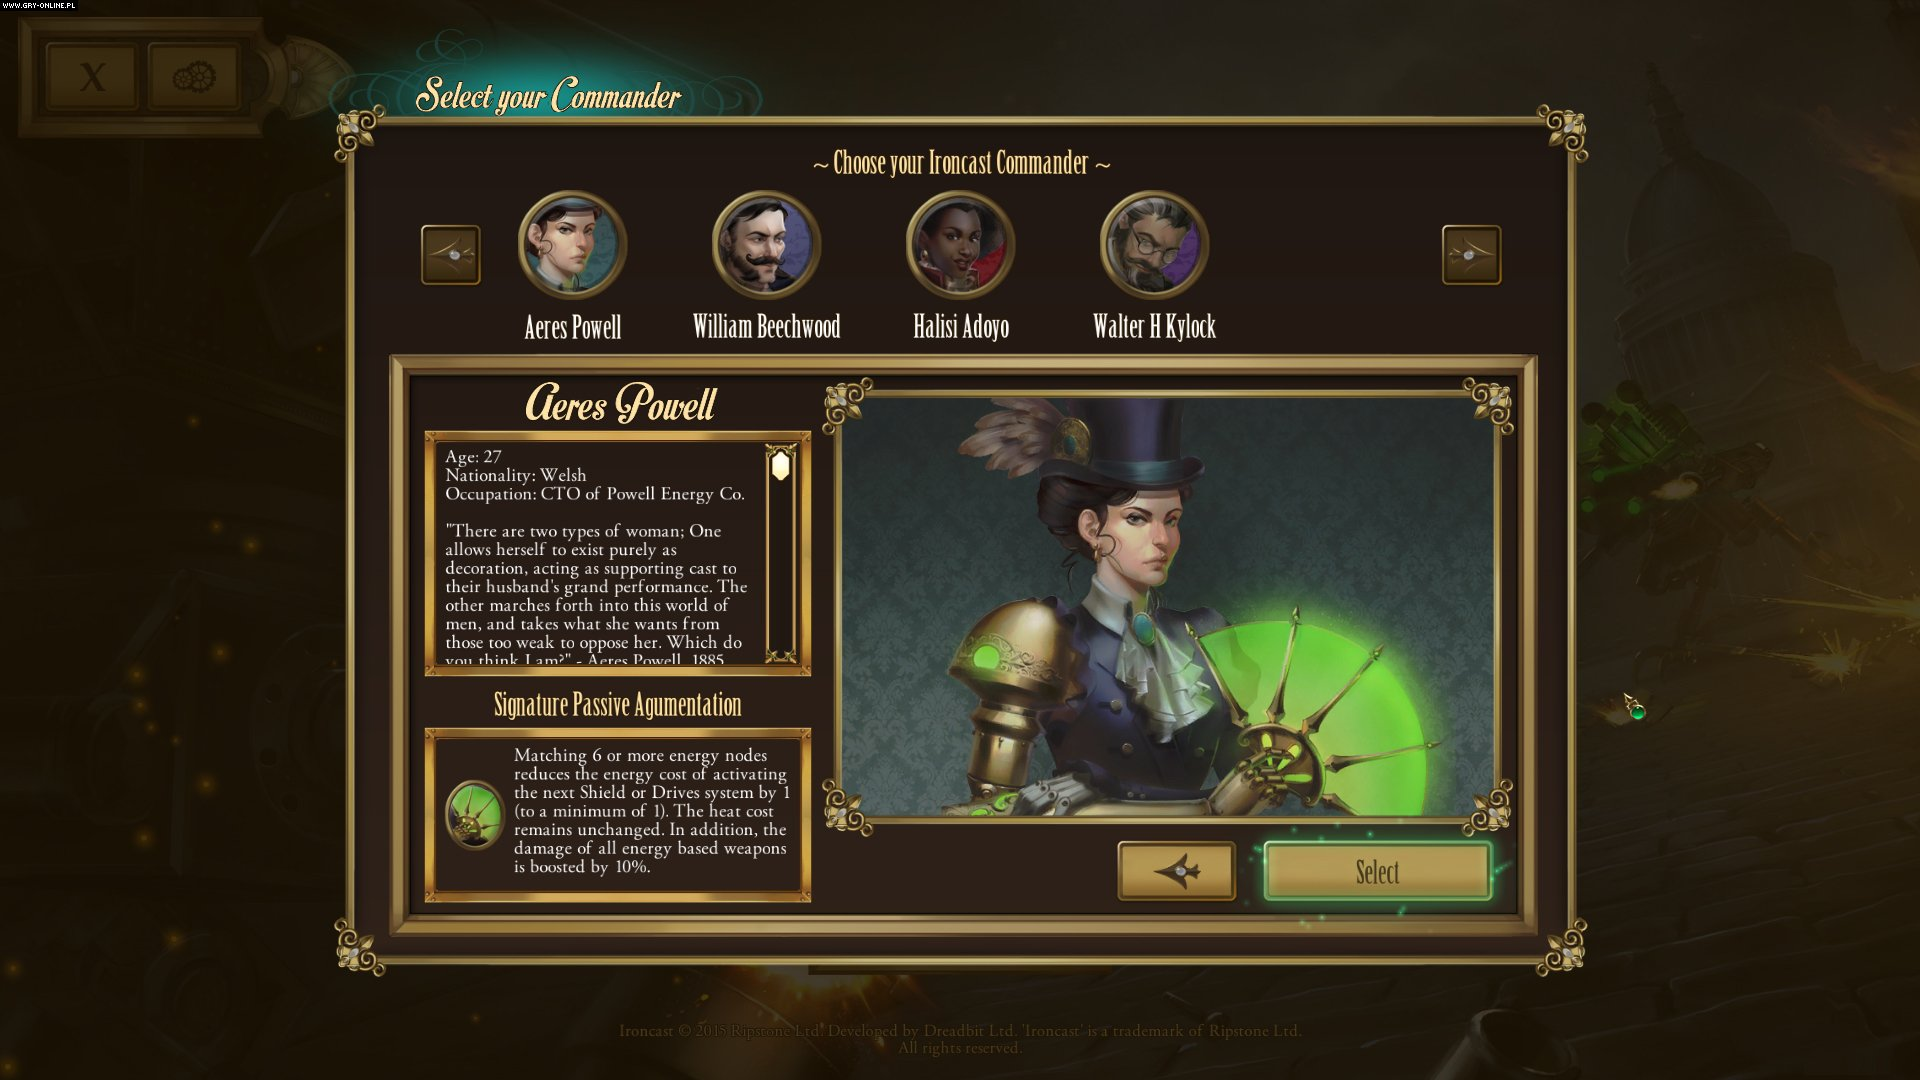 Ps4 Games Science Fiction : Ironcast screenshots gallery screenshot